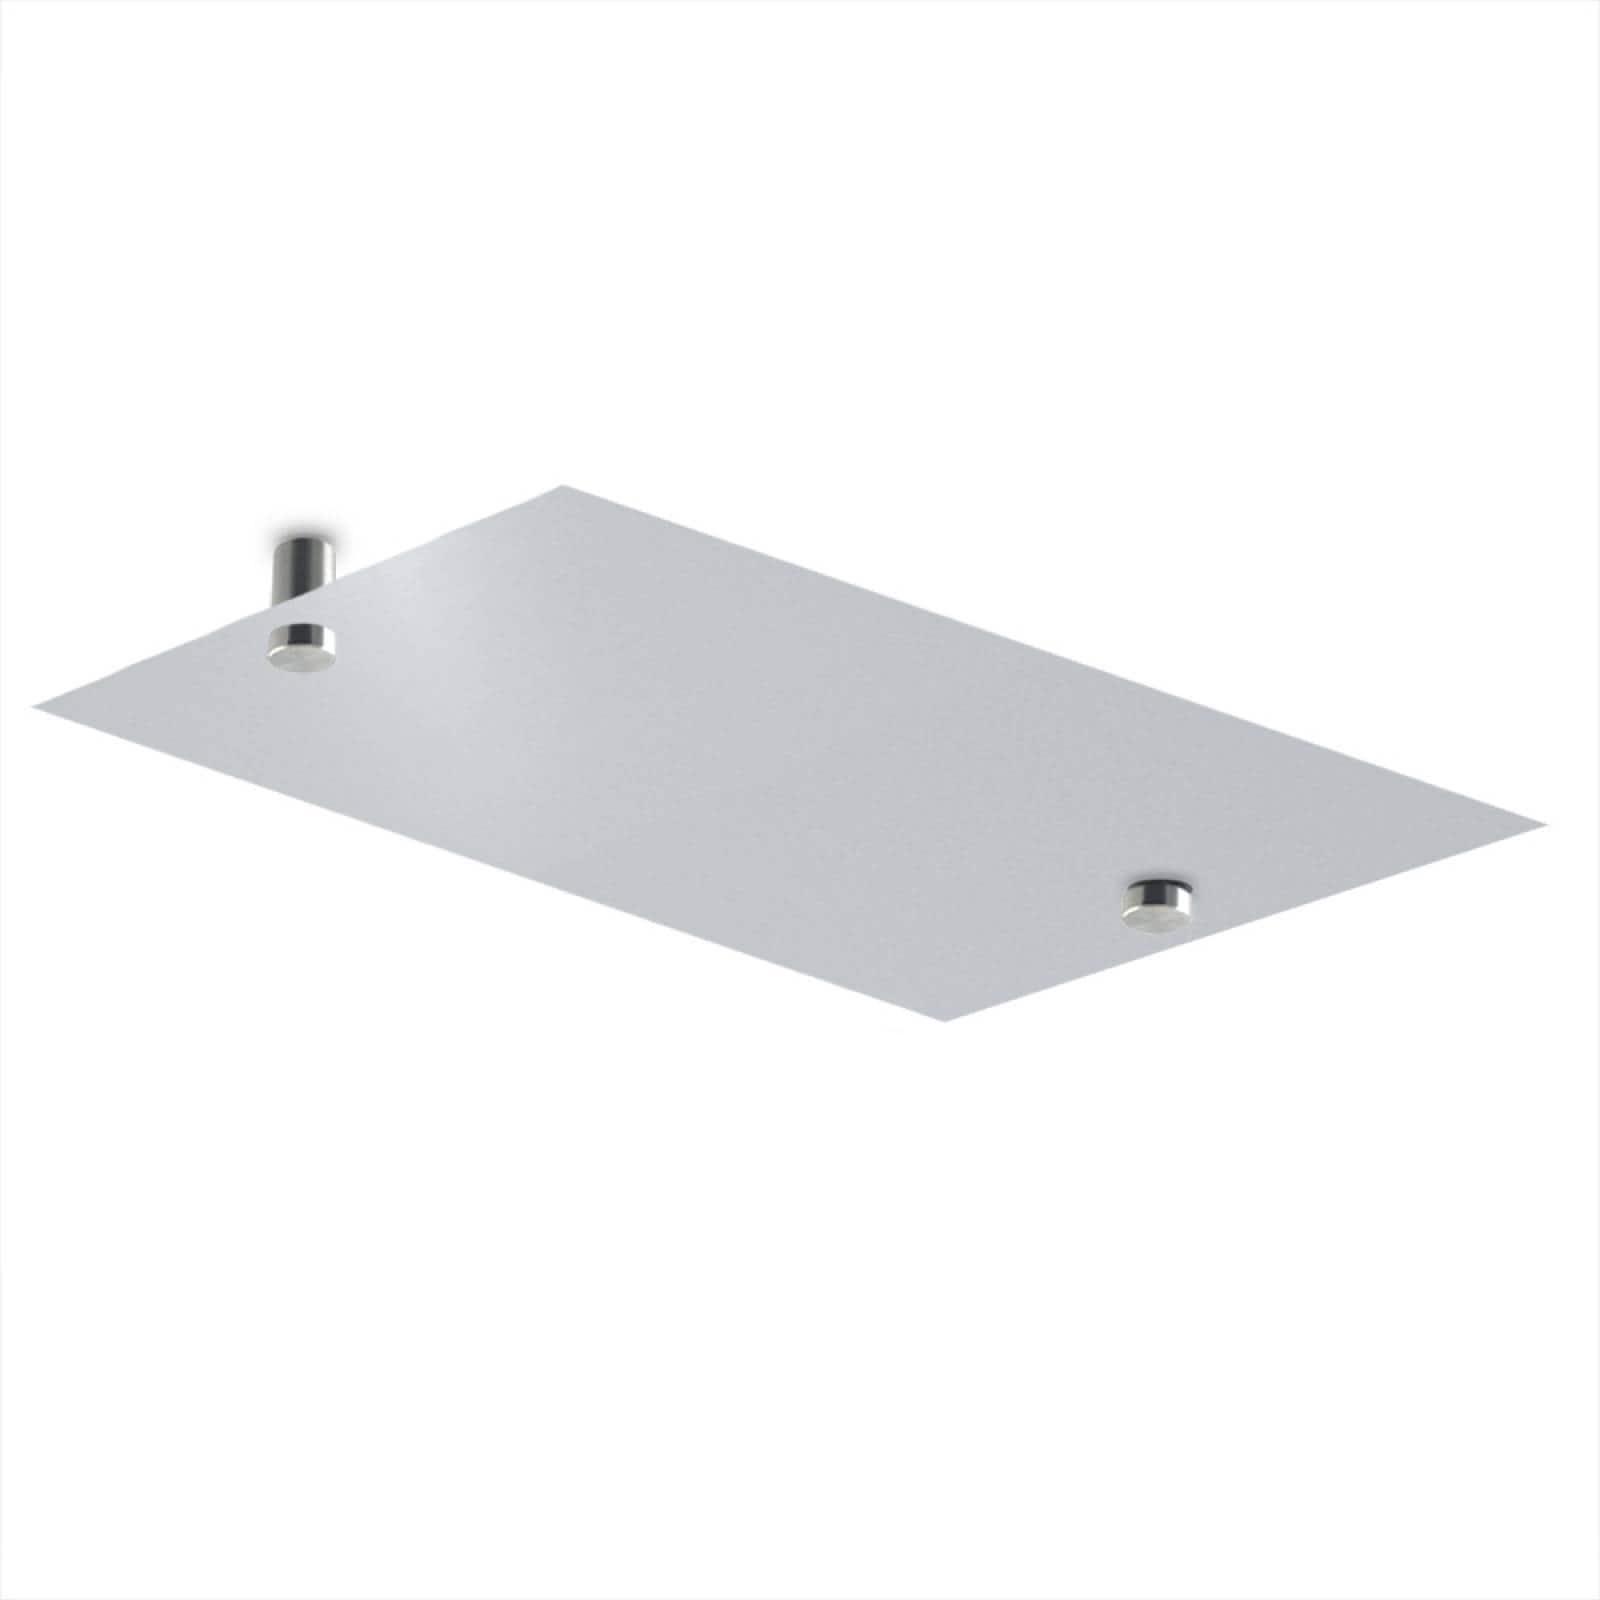 Calefactor de Panel infrarrojo en Aluminio para Techo, Ontario Wave White Cloud de 165W 59x29cm, Mod: 380CaSol-TB